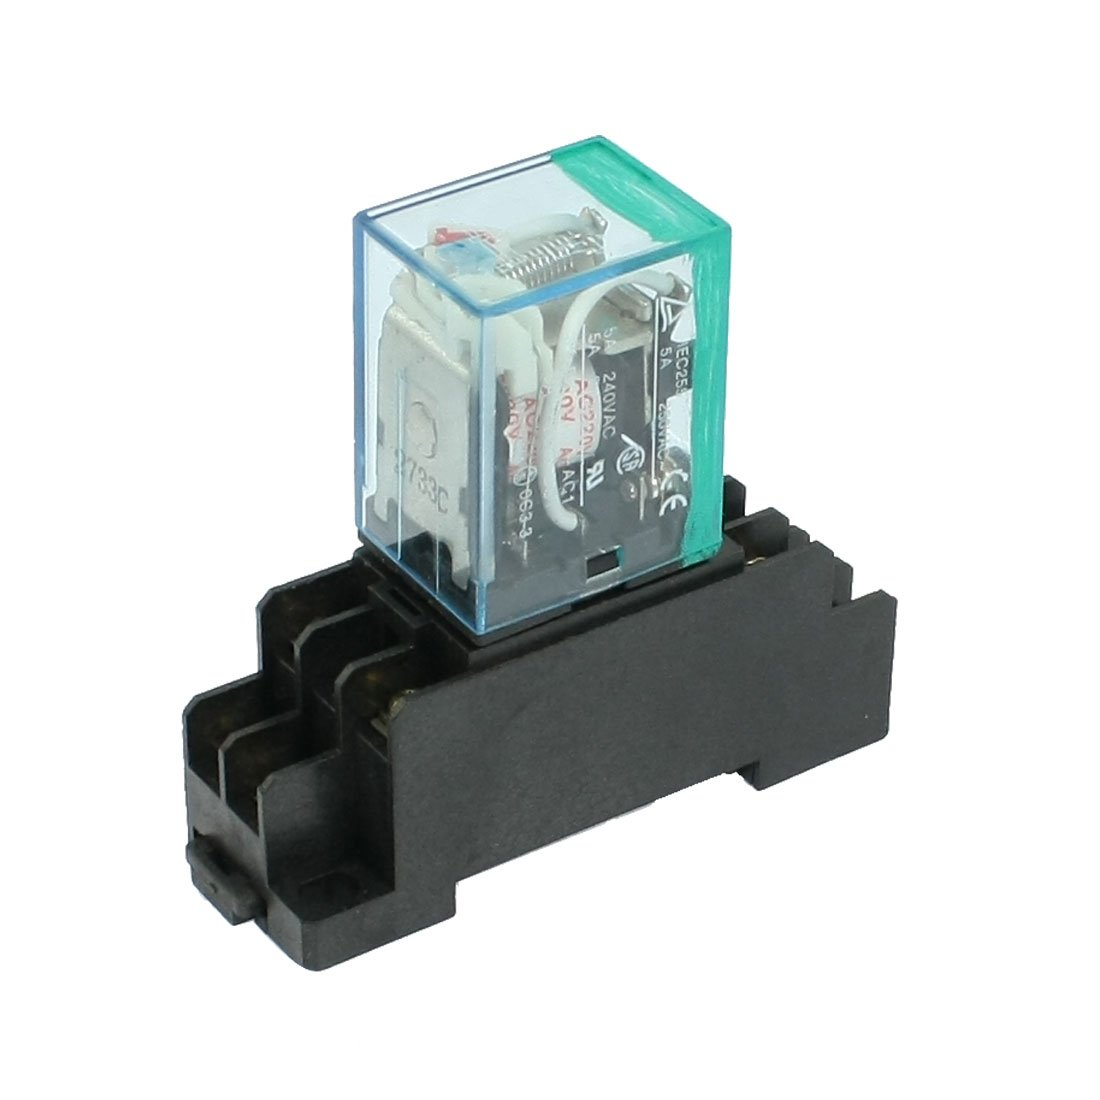 Online Buy Wholesale Dpdt Relay Socket From China Dpdt Relay - Dpdt relay buy